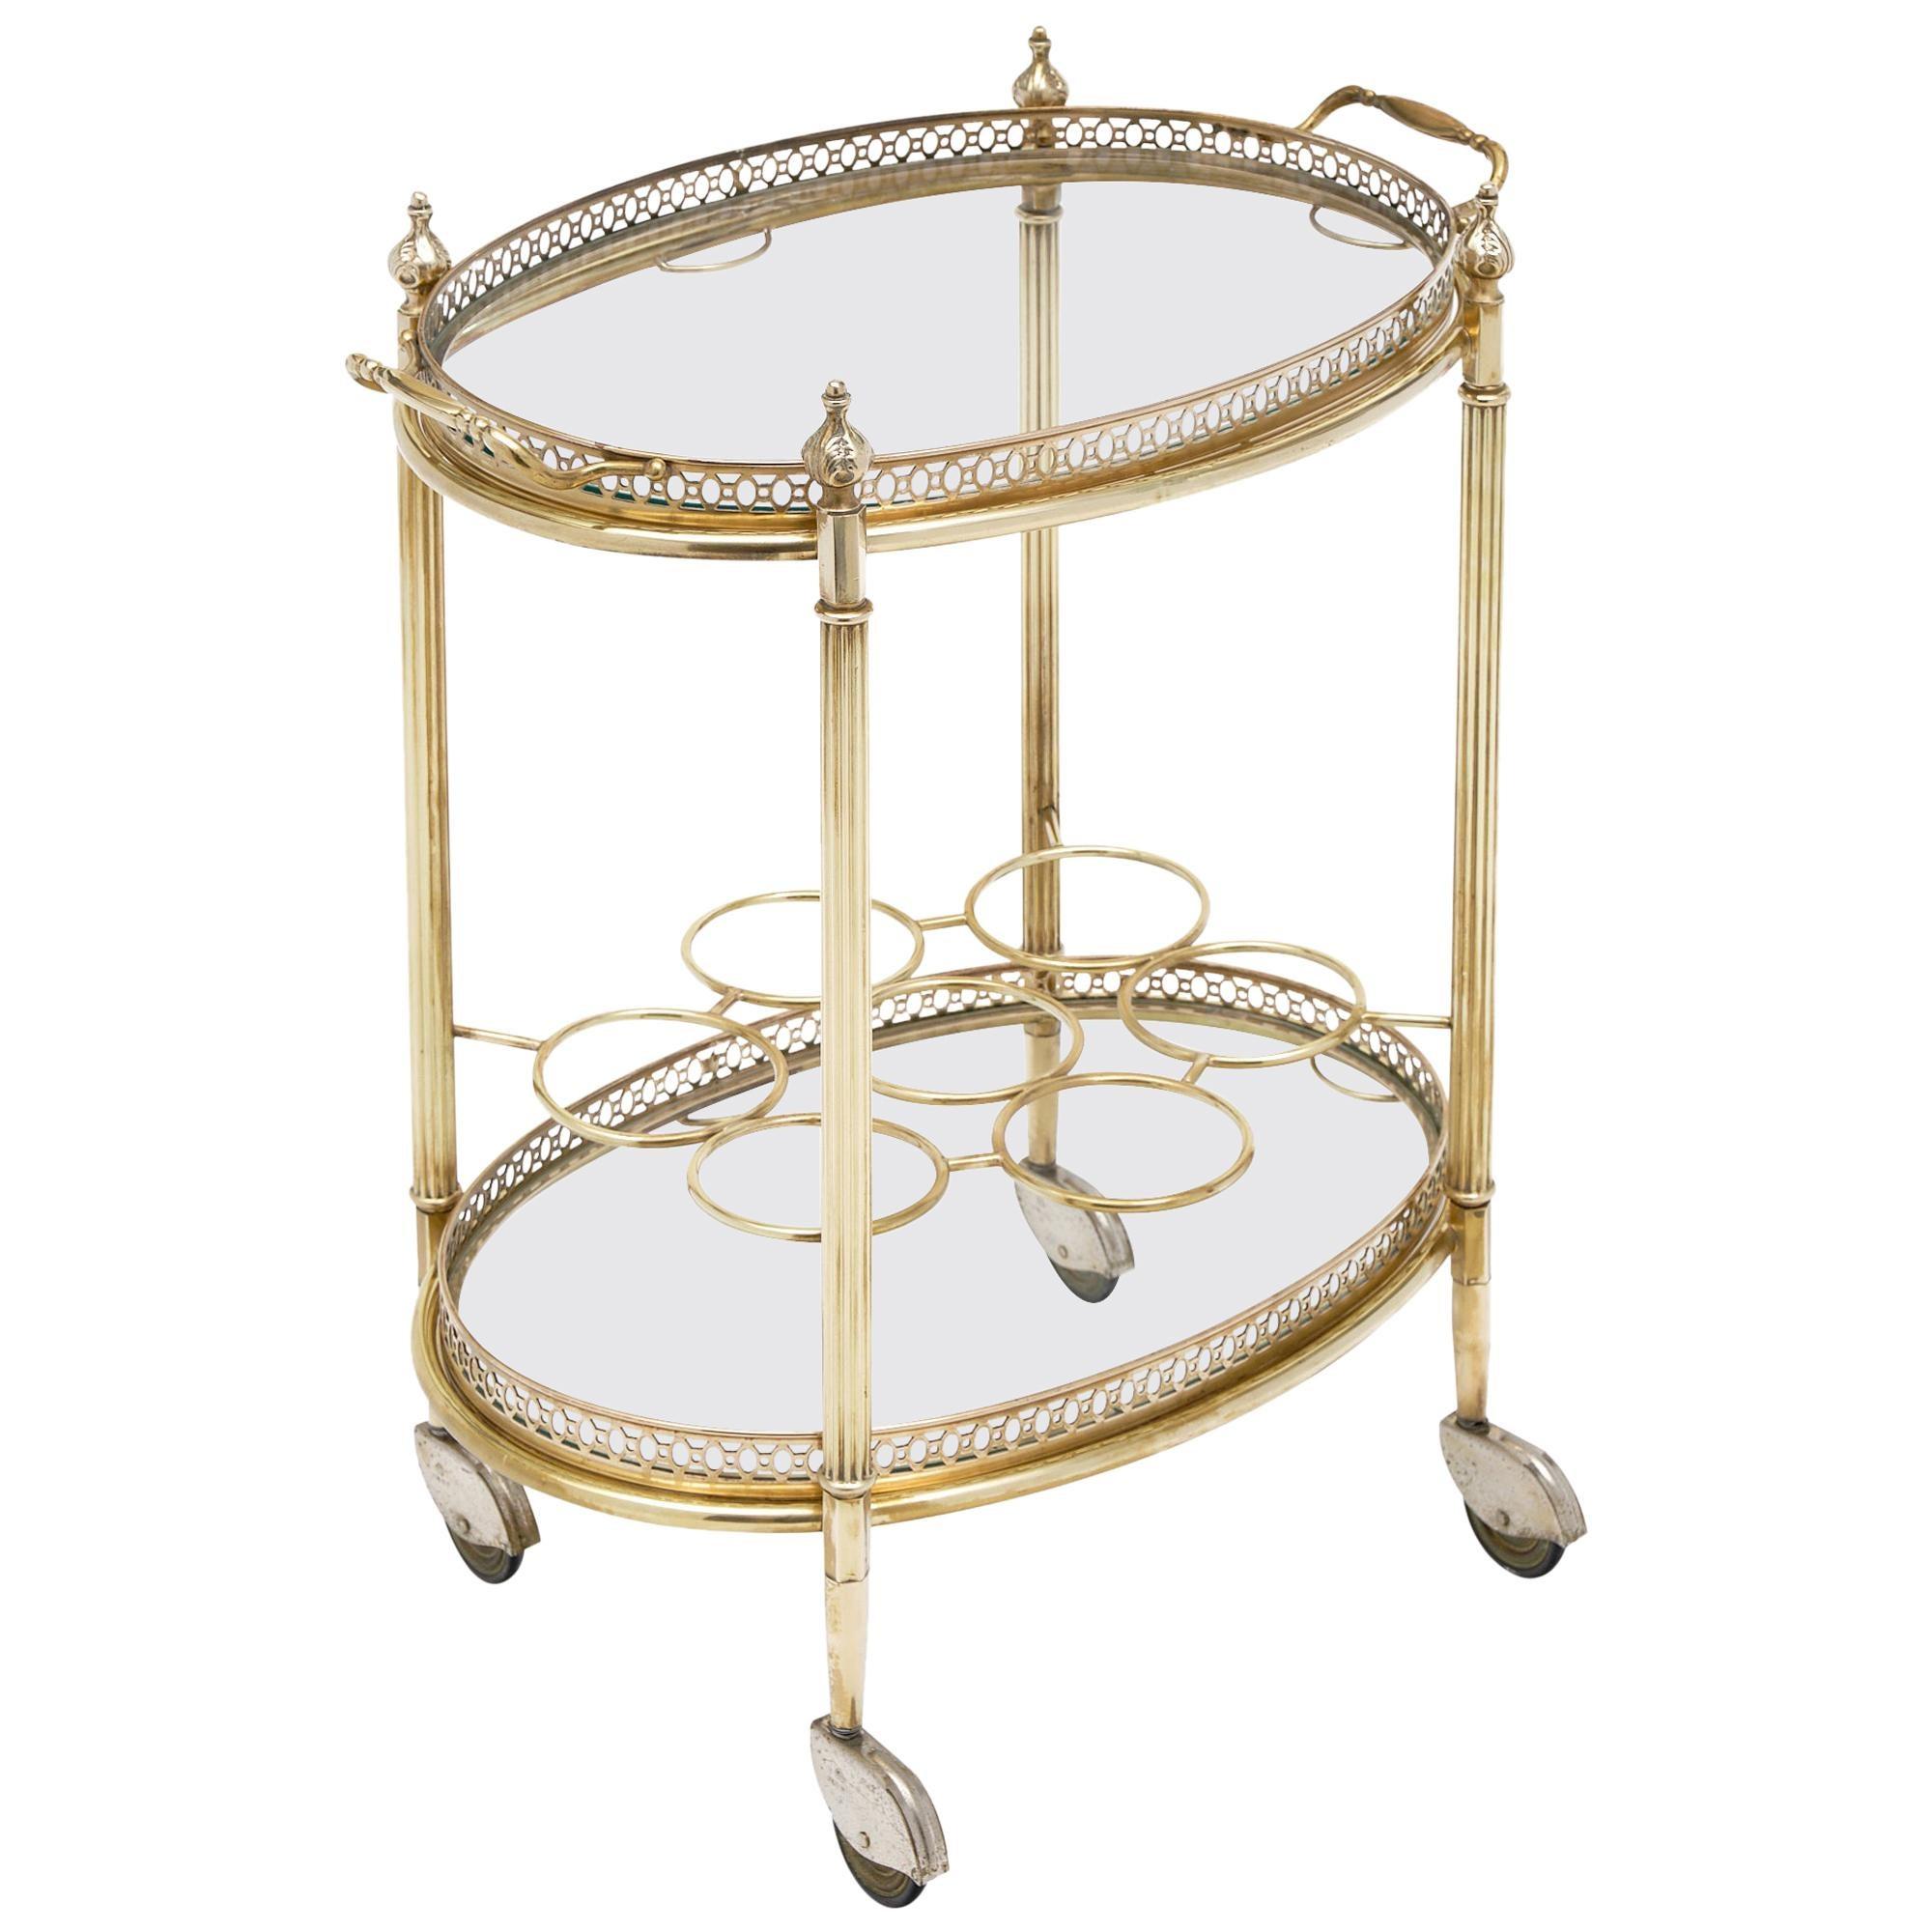 French Art Deco Period Bar Cart